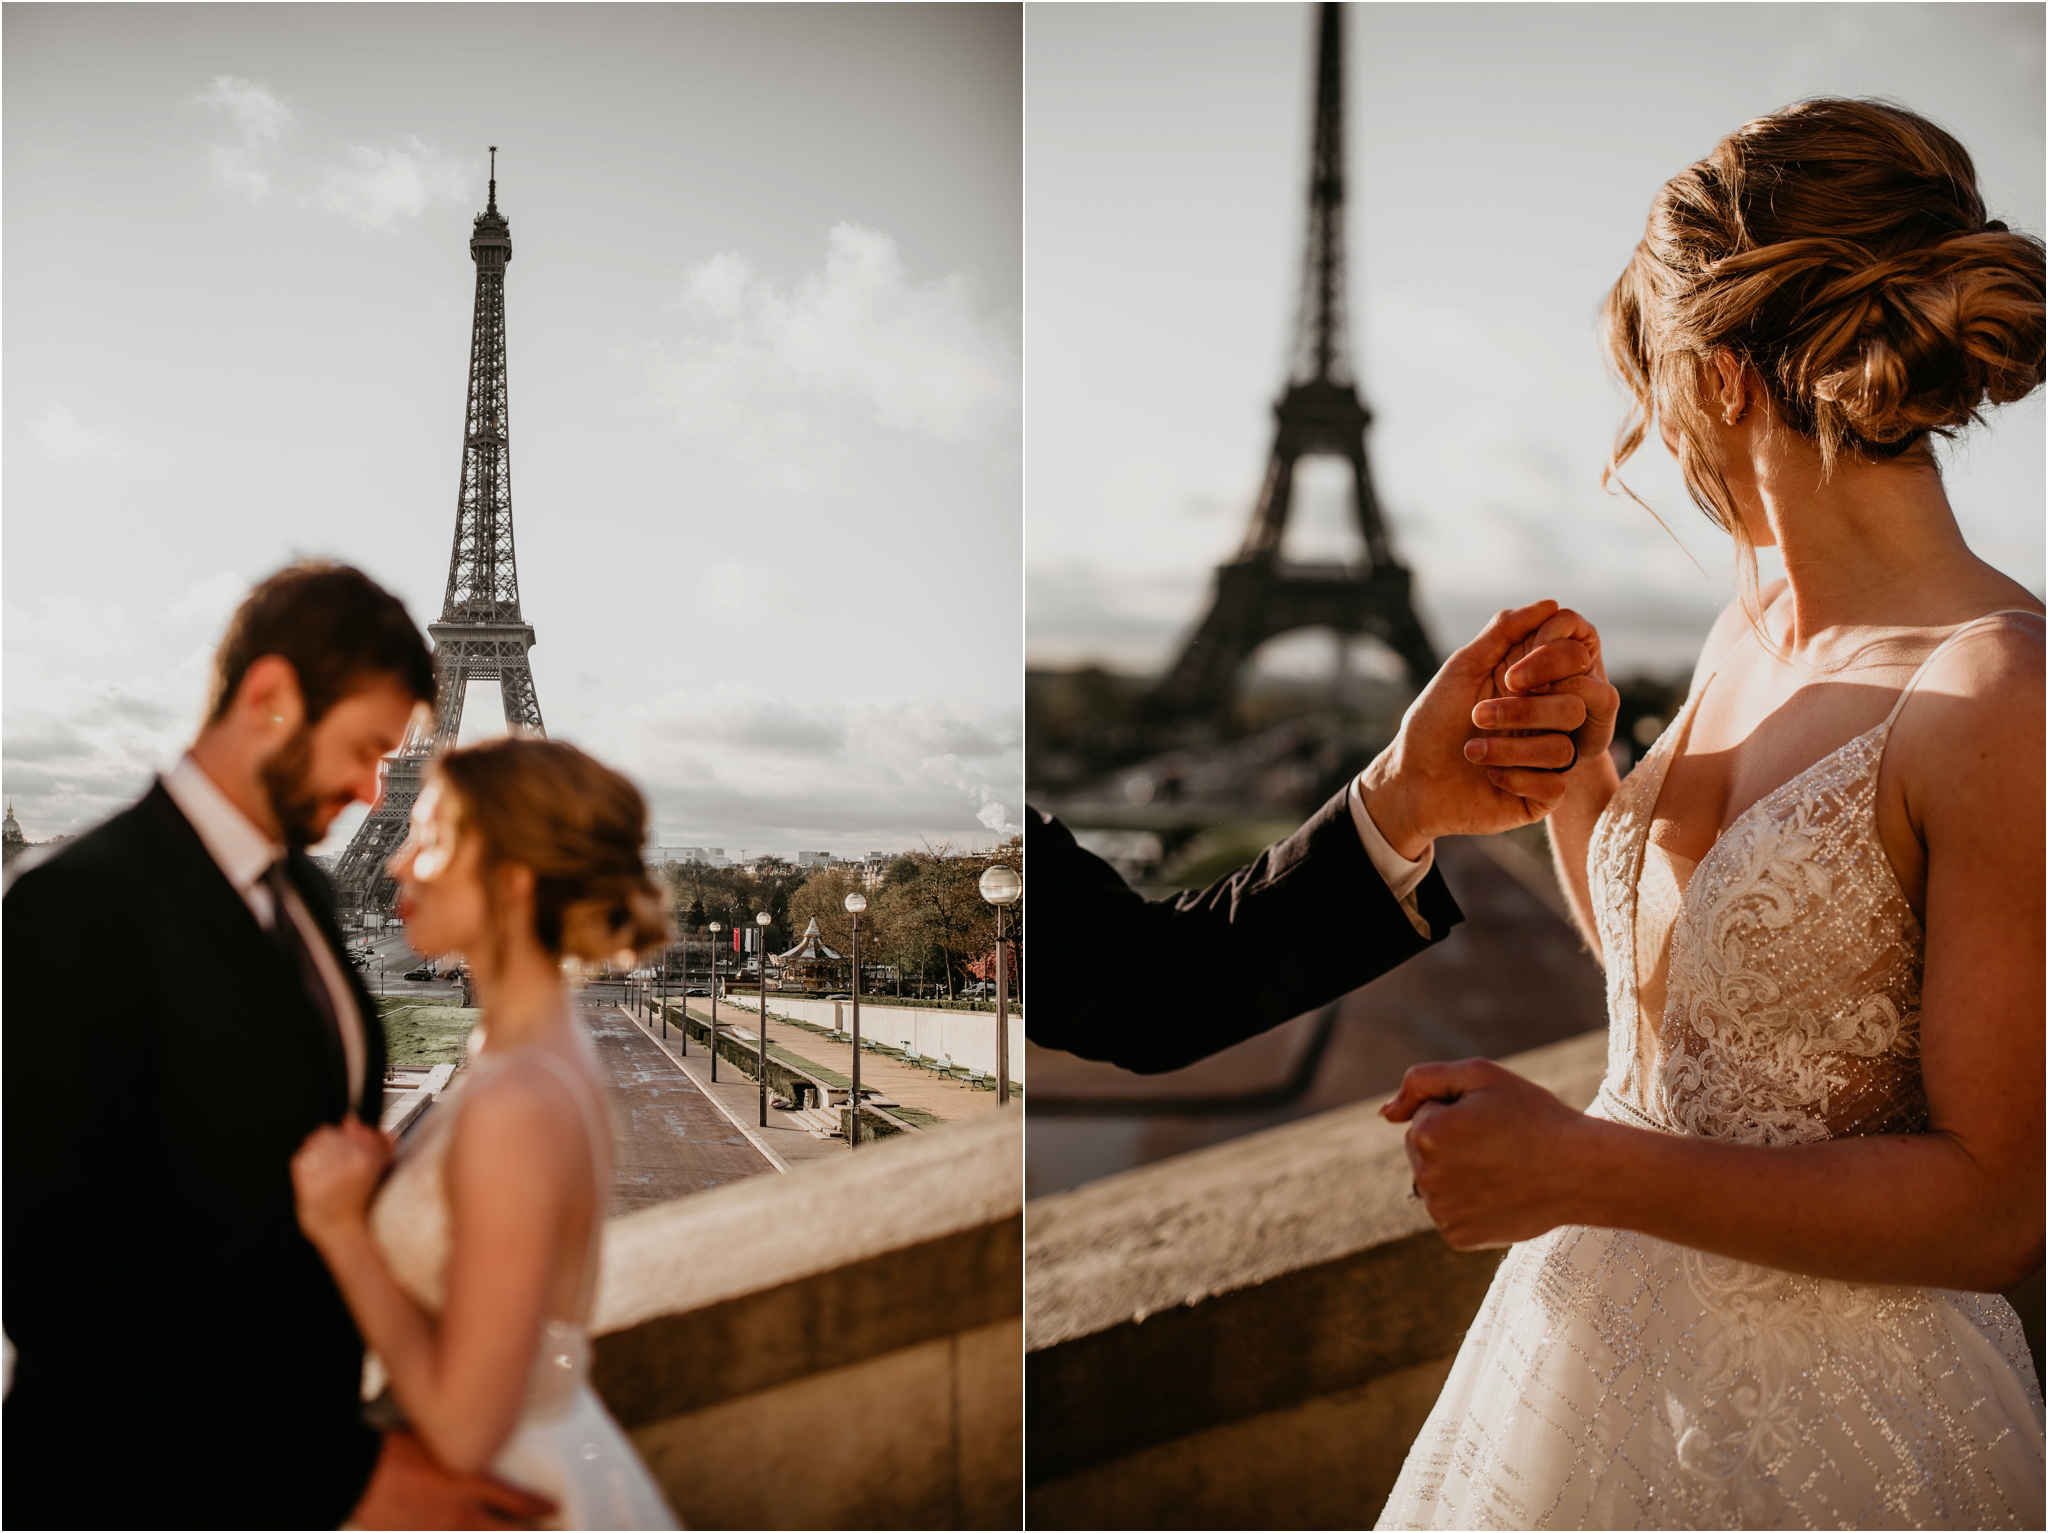 miranda-and-jared-paris-elopement-destination-wedding-photographer-053.jpg